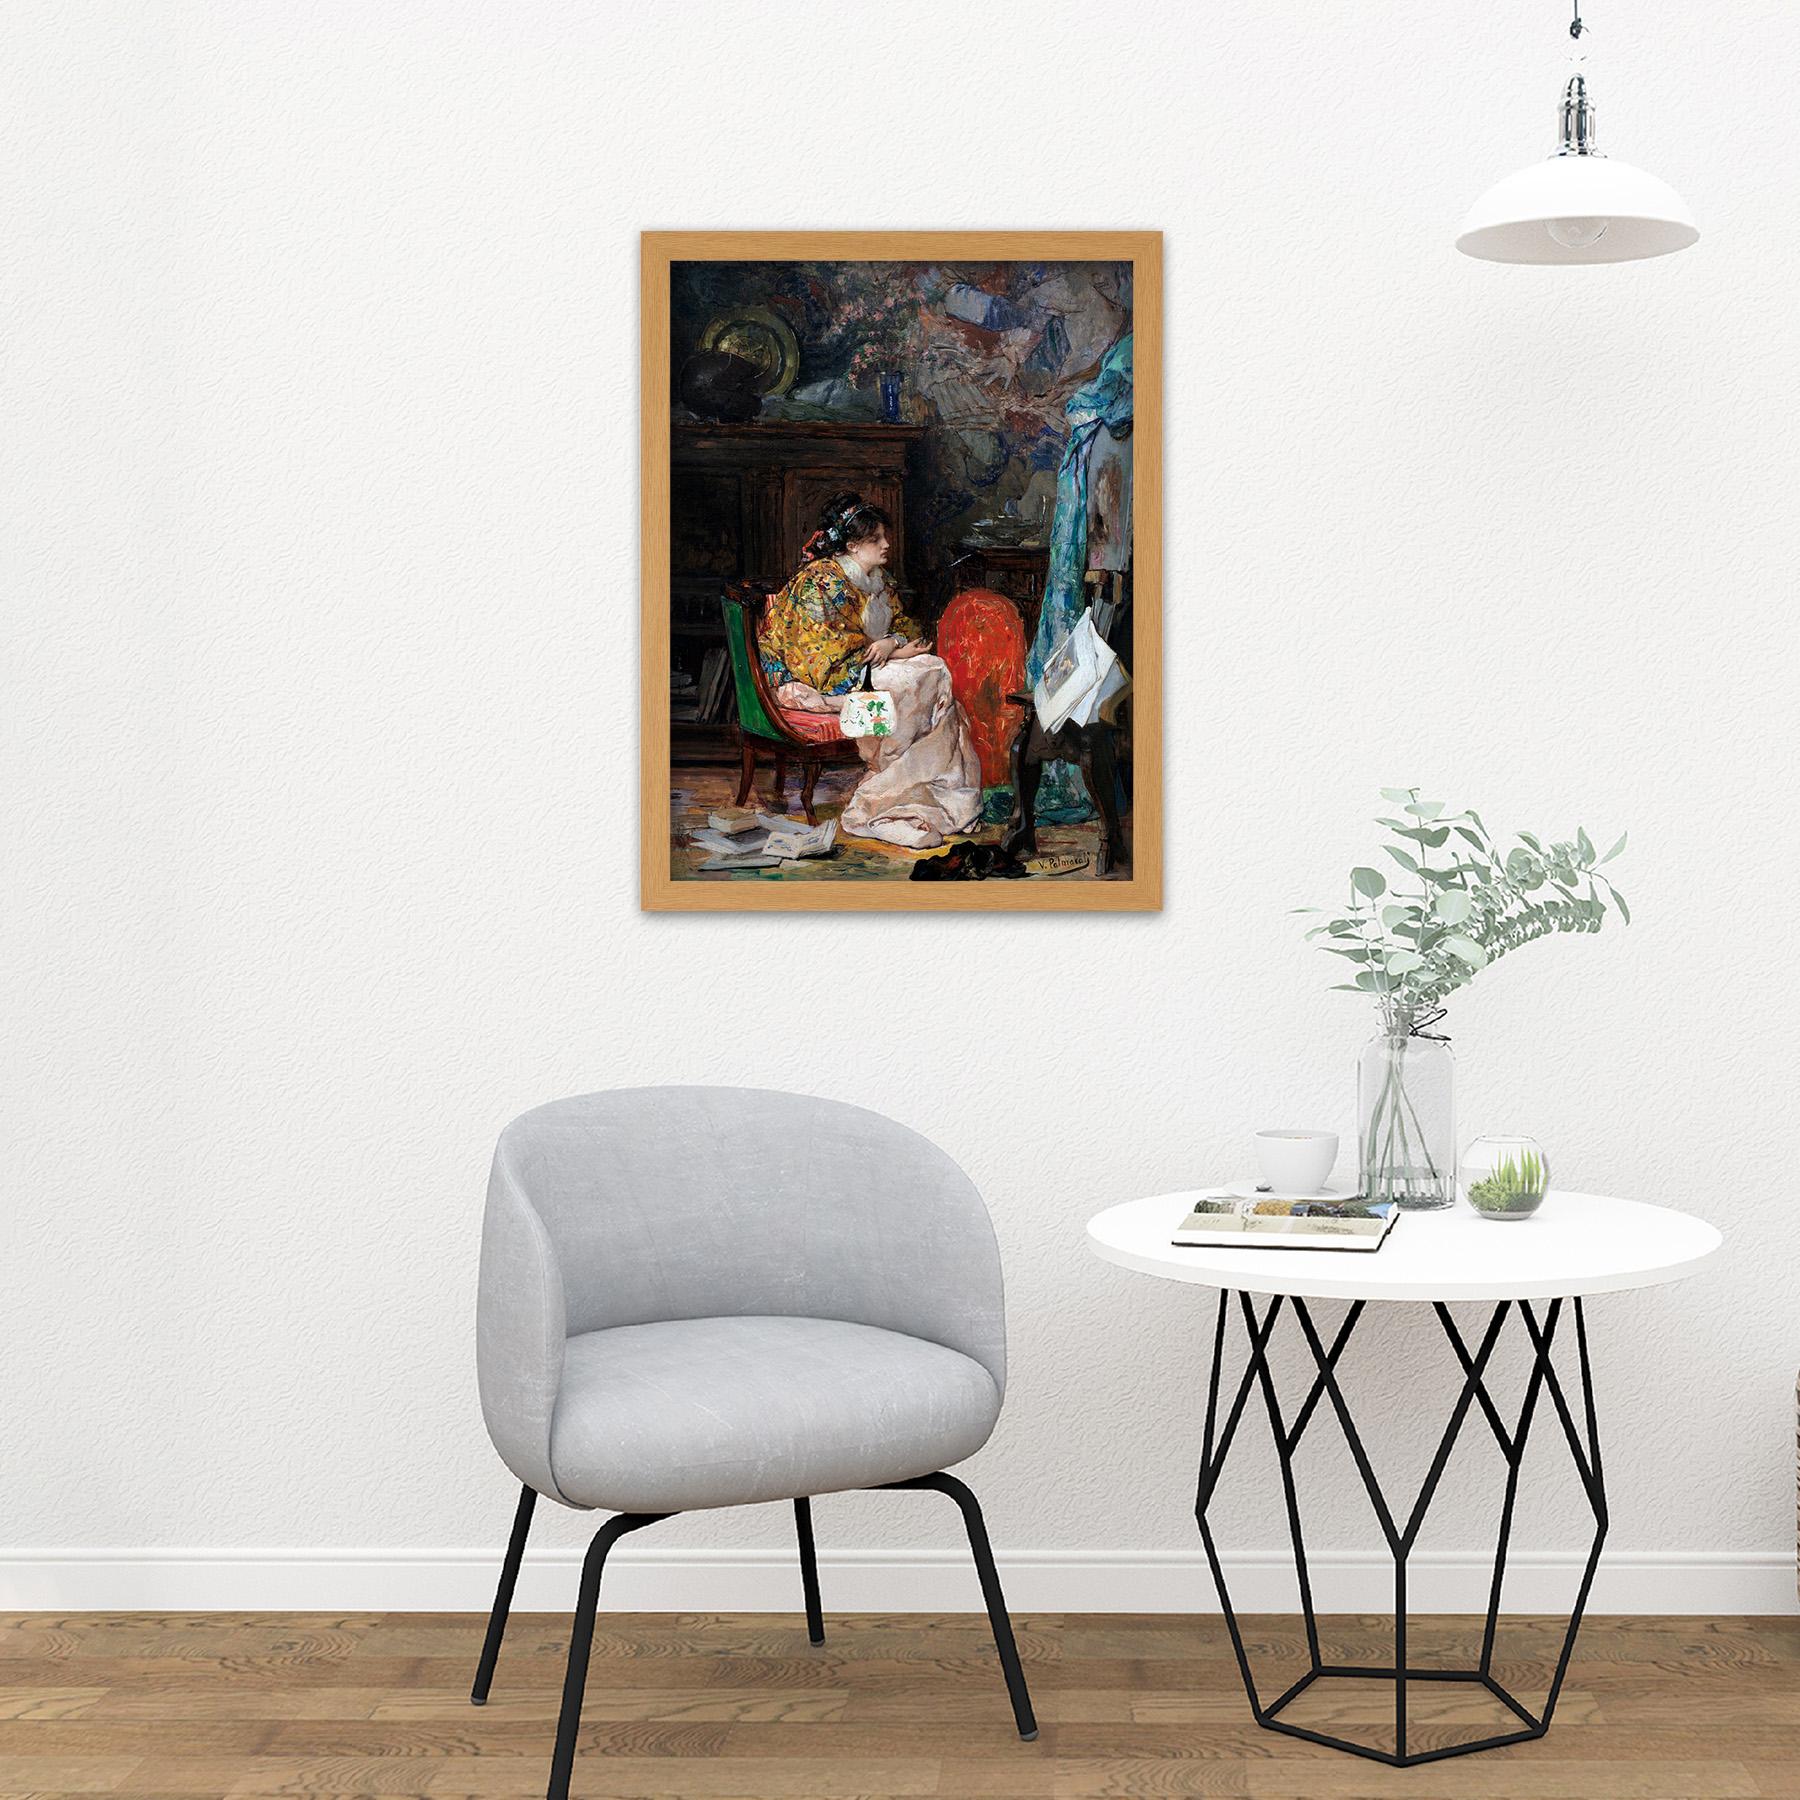 Palmaroli-In-The-Study-Woman-Painting-Large-Framed-Art-Print thumbnail 18